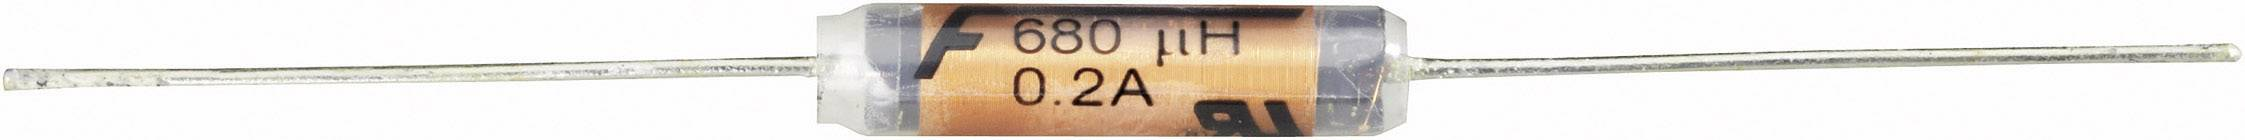 Cívka Fastron MESC-471M-01, 470 µH, 0,3 A, 10 %, MESC-471, ferit